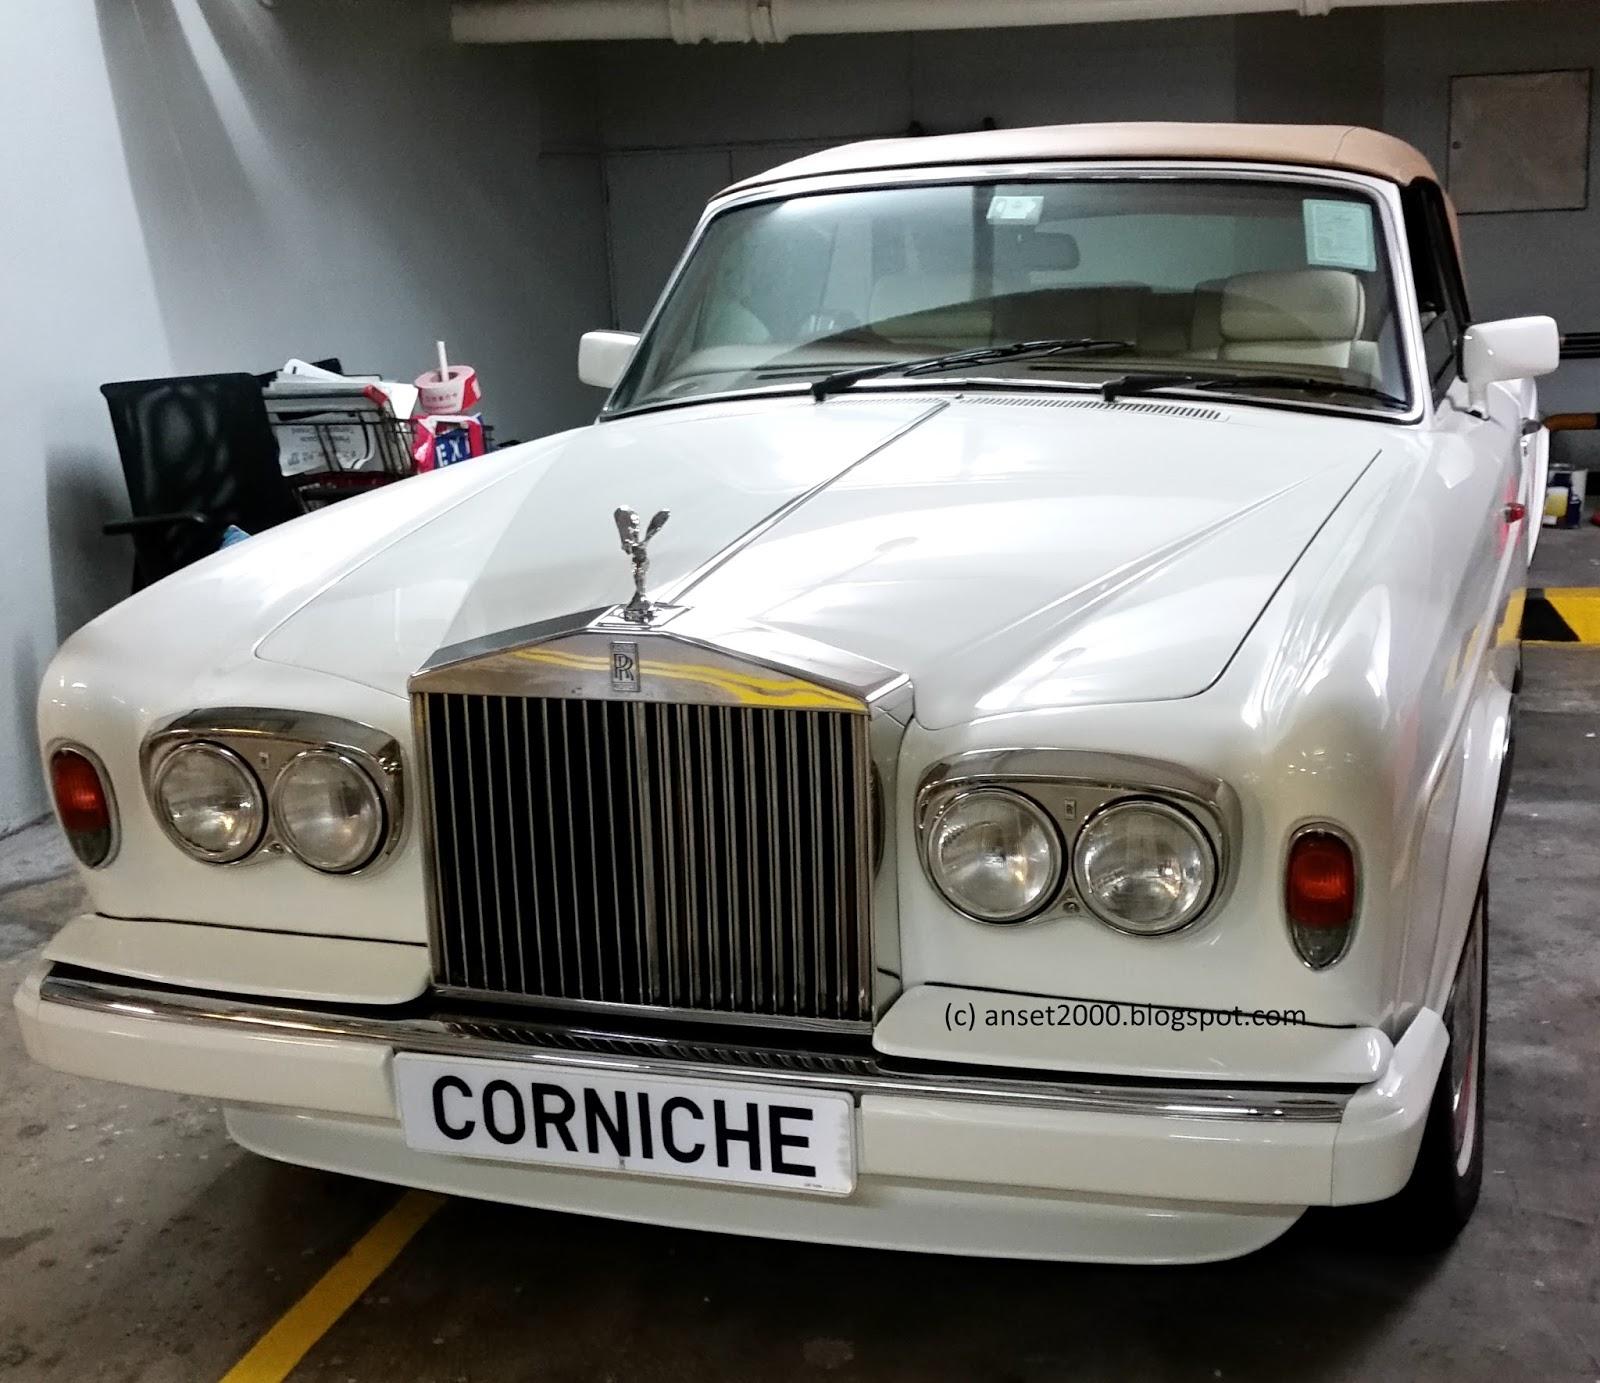 Rolls-Royce Corniche I - IV 1971 - 1995 Sedan 2 door #2